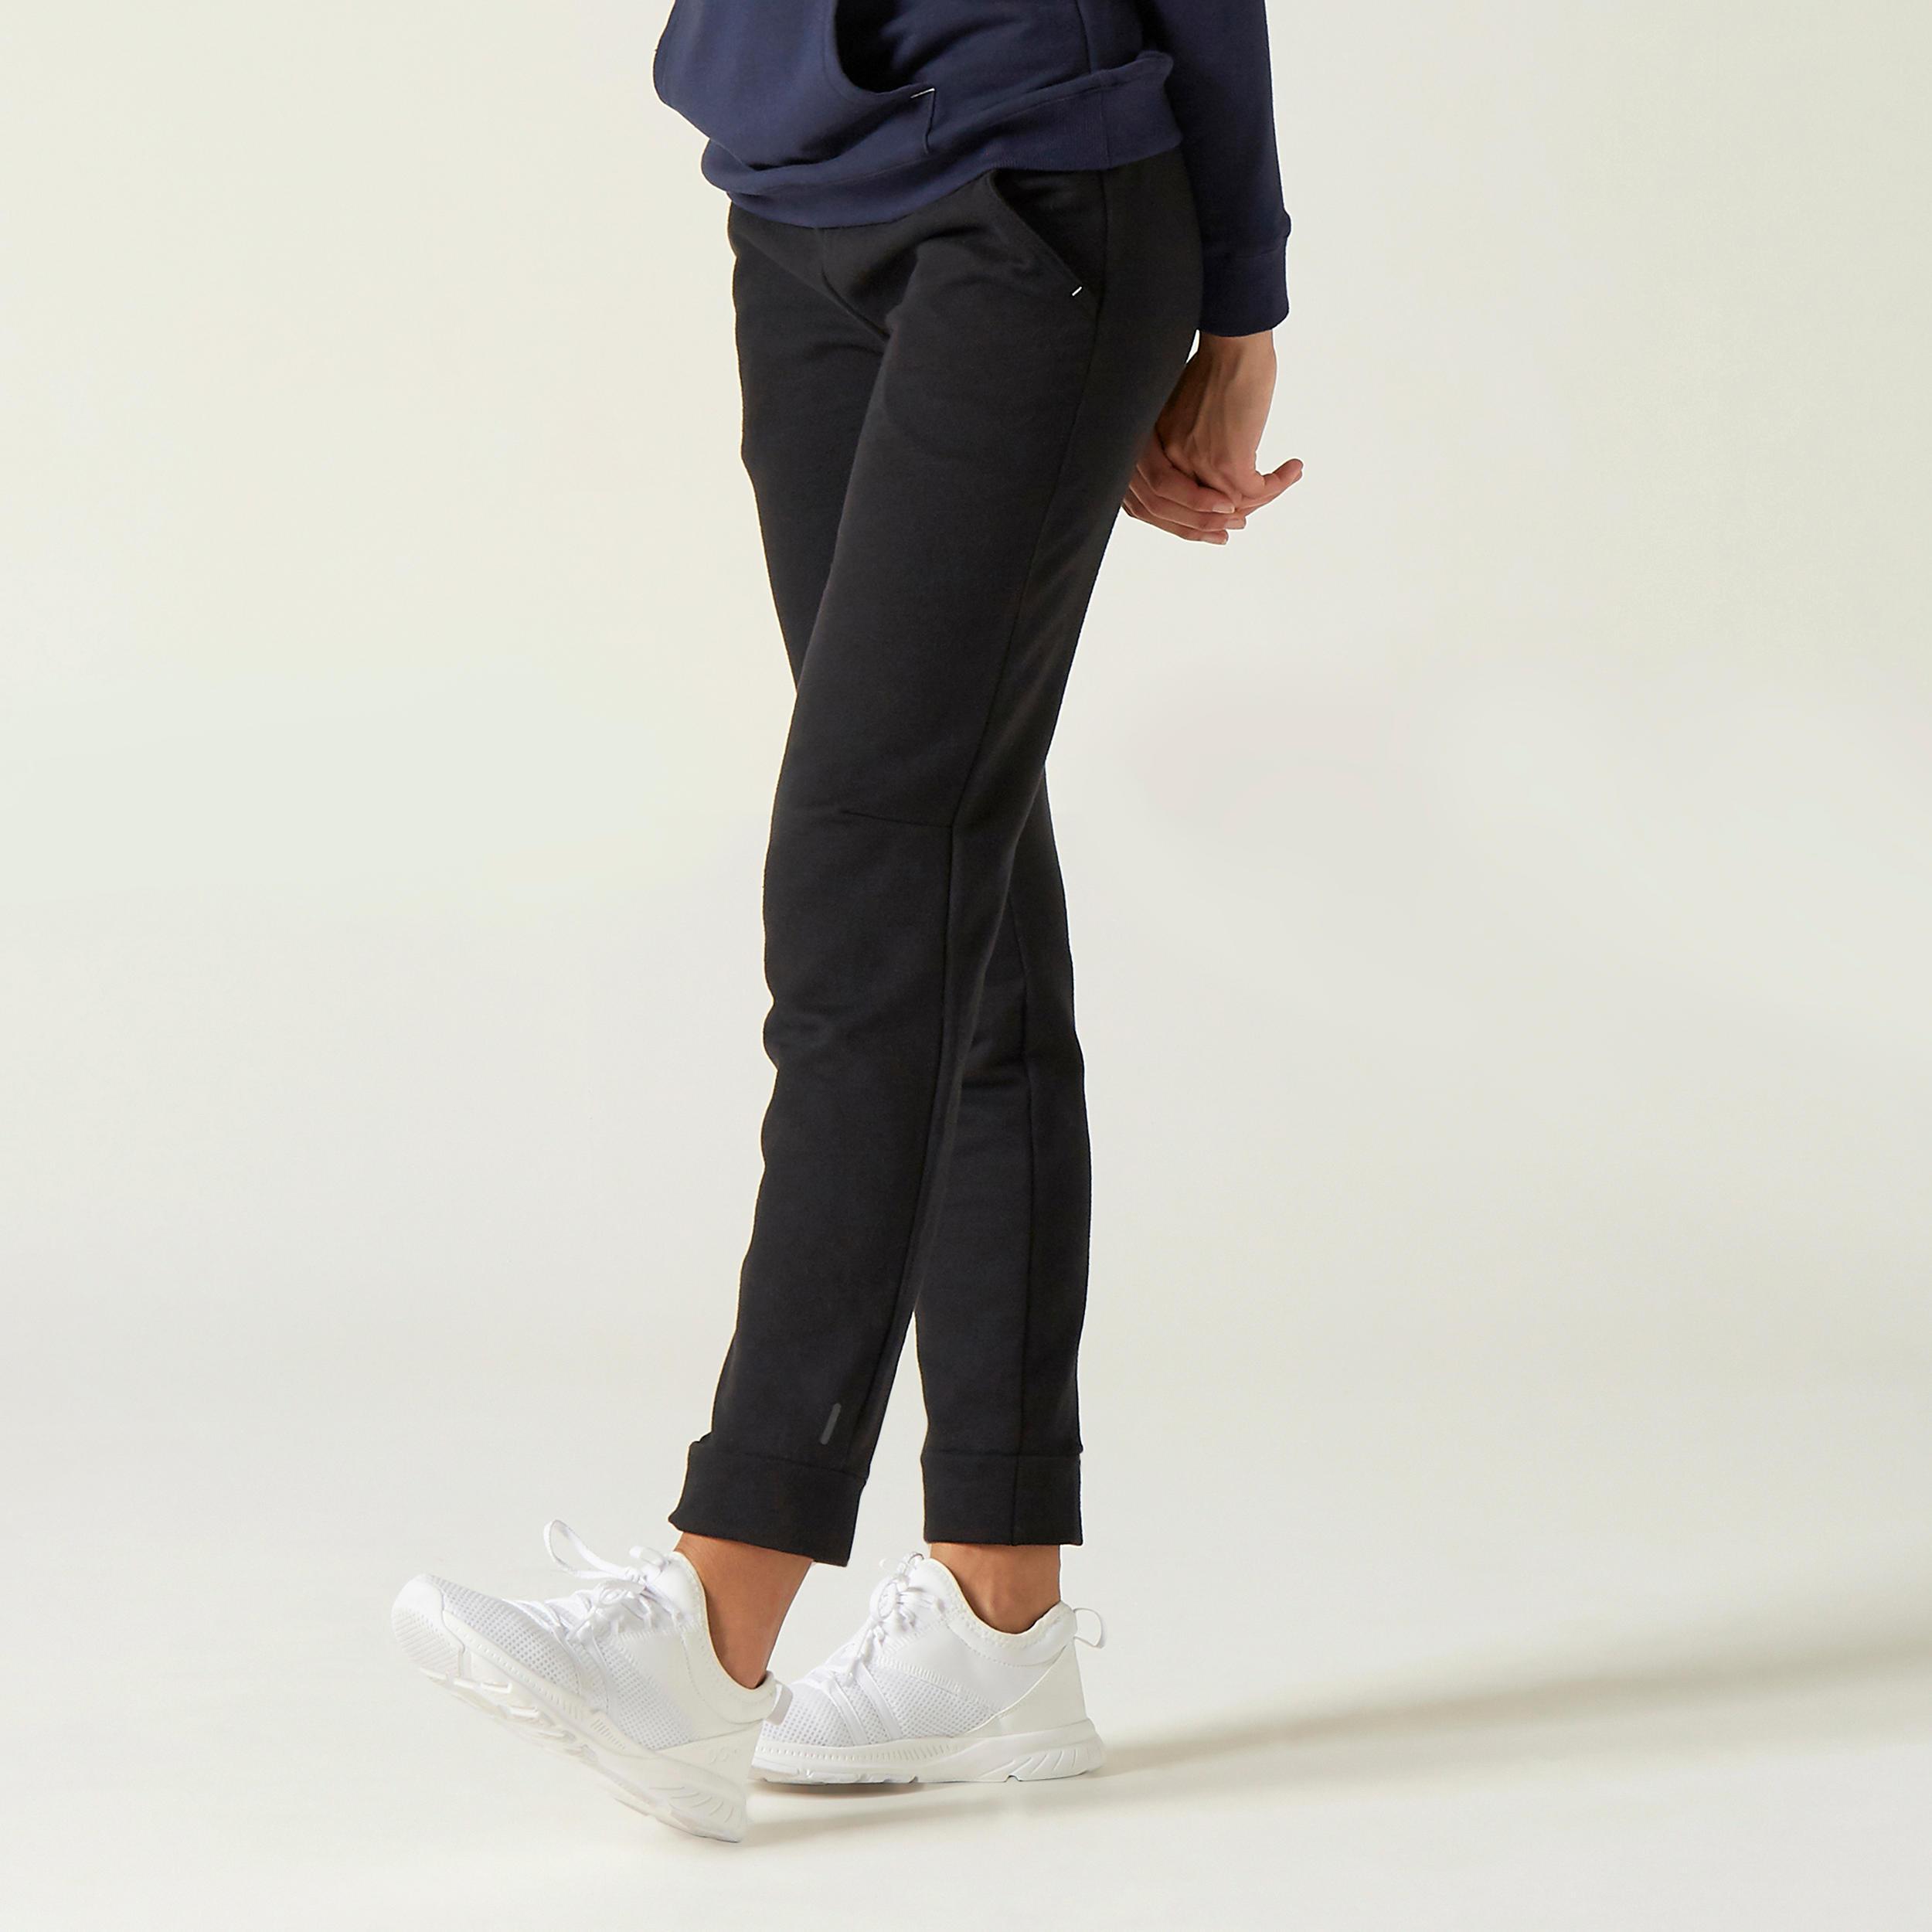 Pantalon regular 500 Damă